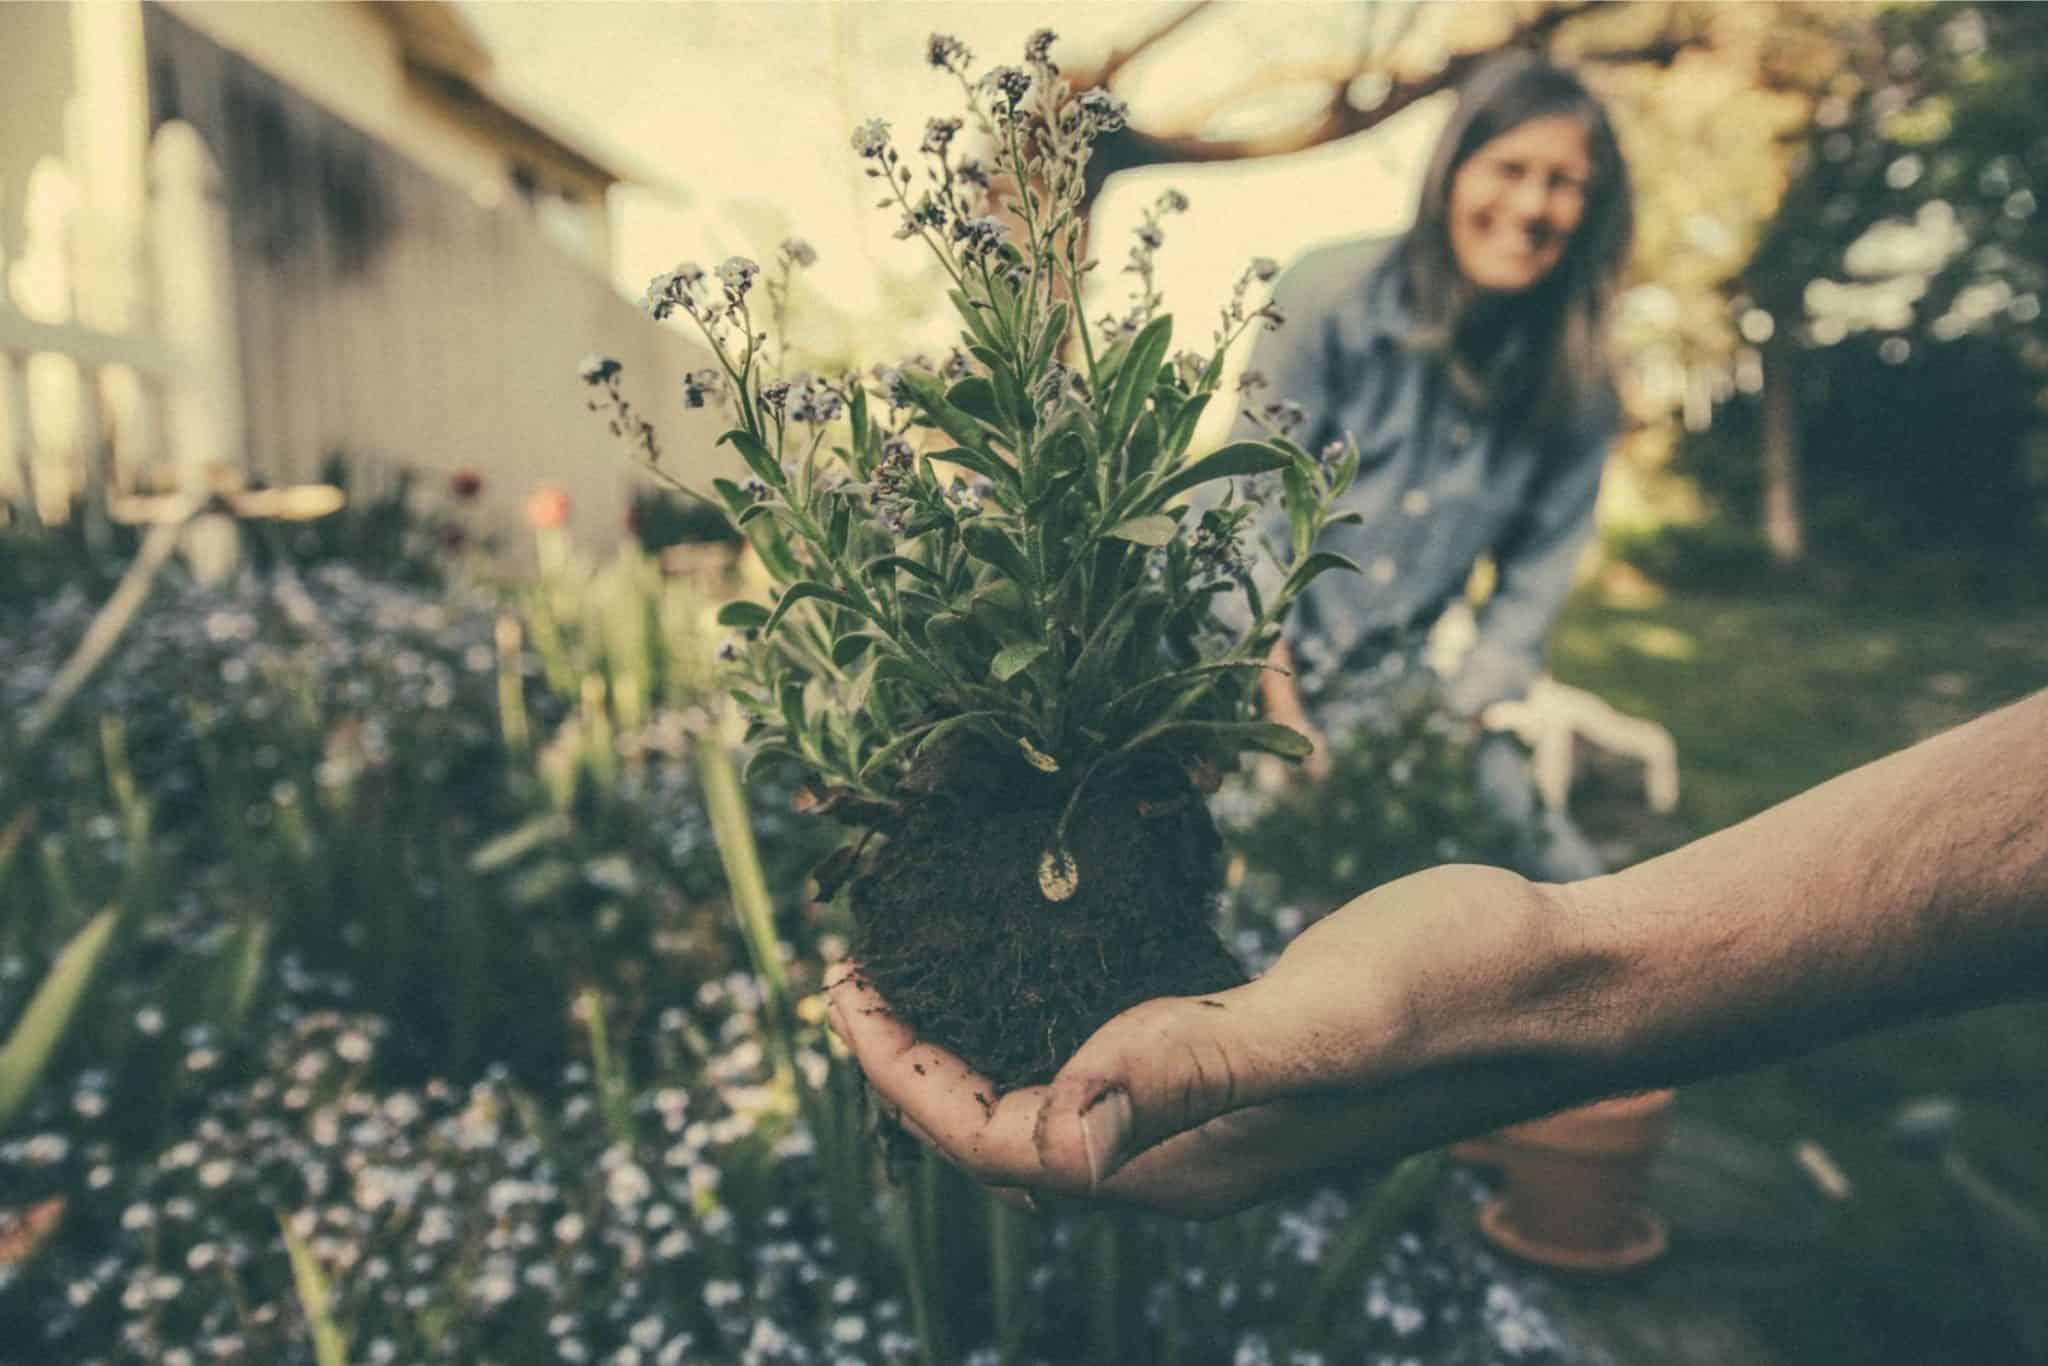 herbal-gardening-health-benefits-4-heart-care